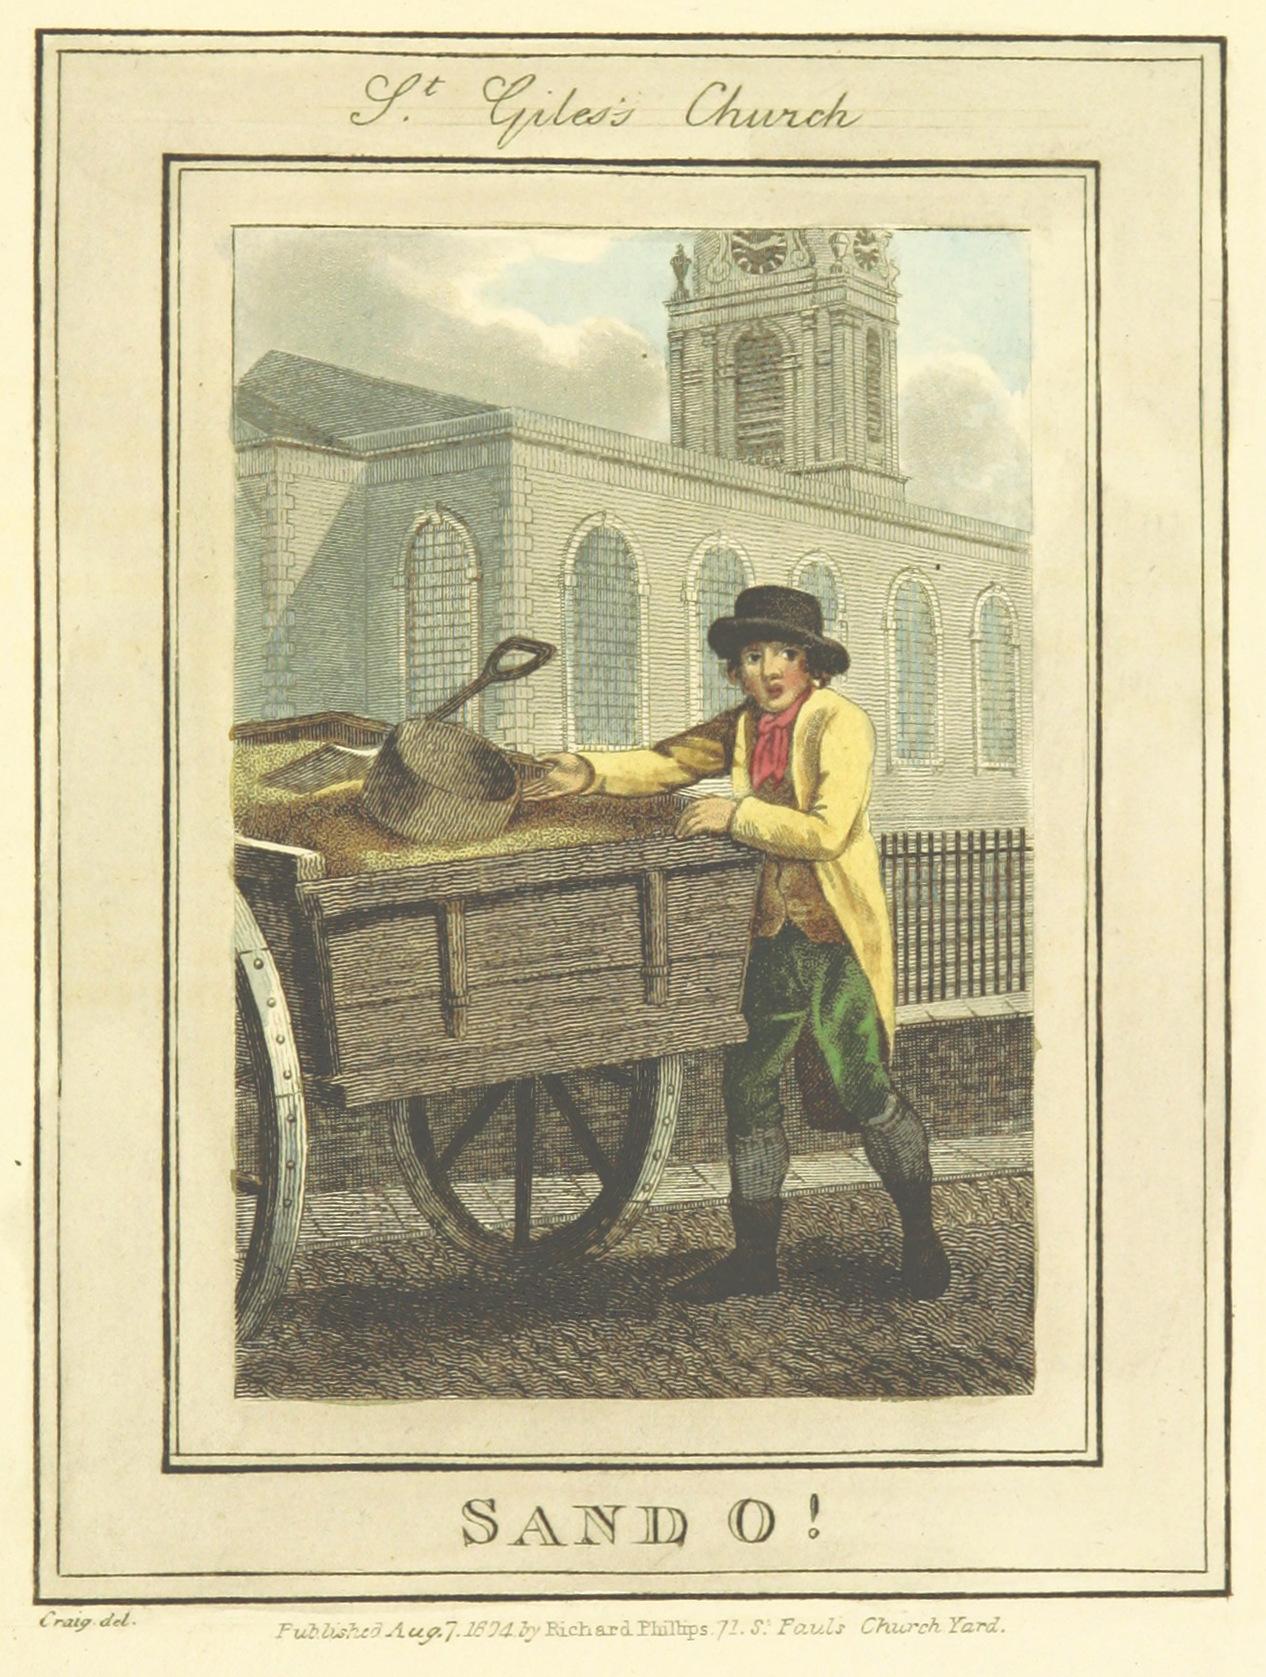 Phillips(1804)_p653_-_St_Giless_Church_-_Sand_O!